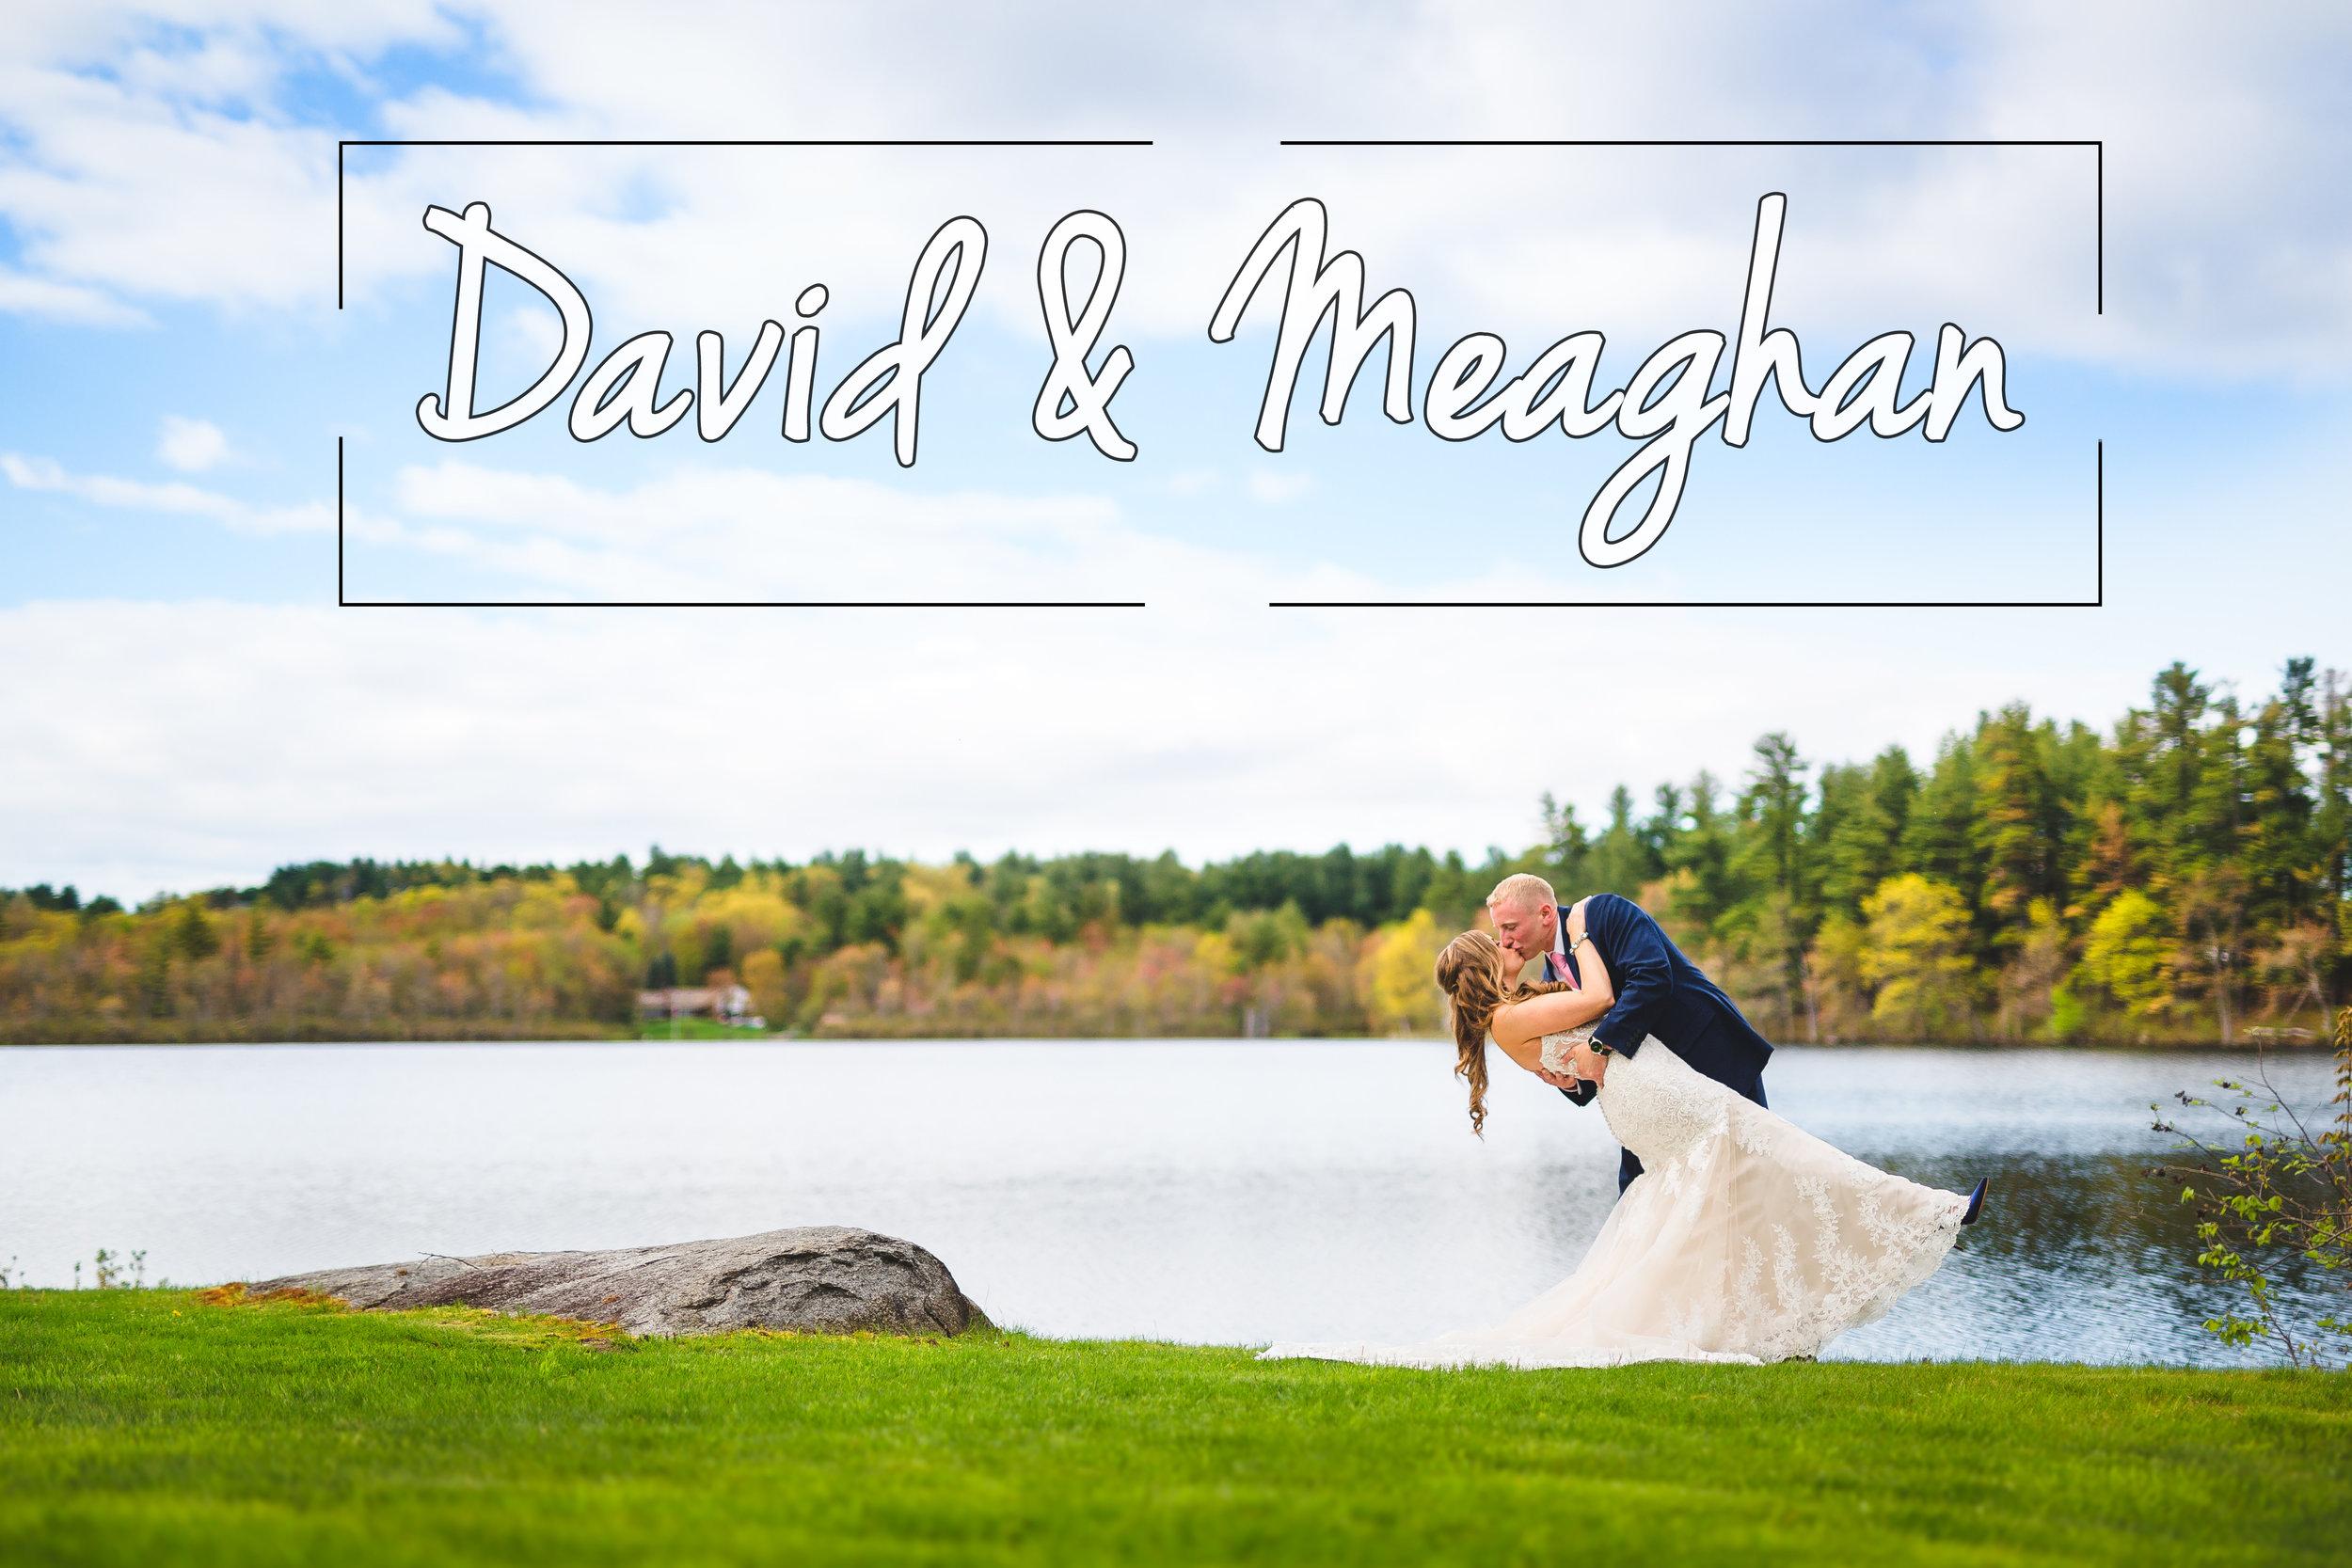 1027-David&Meaghan_couplessesh-2B8A2747.jpg